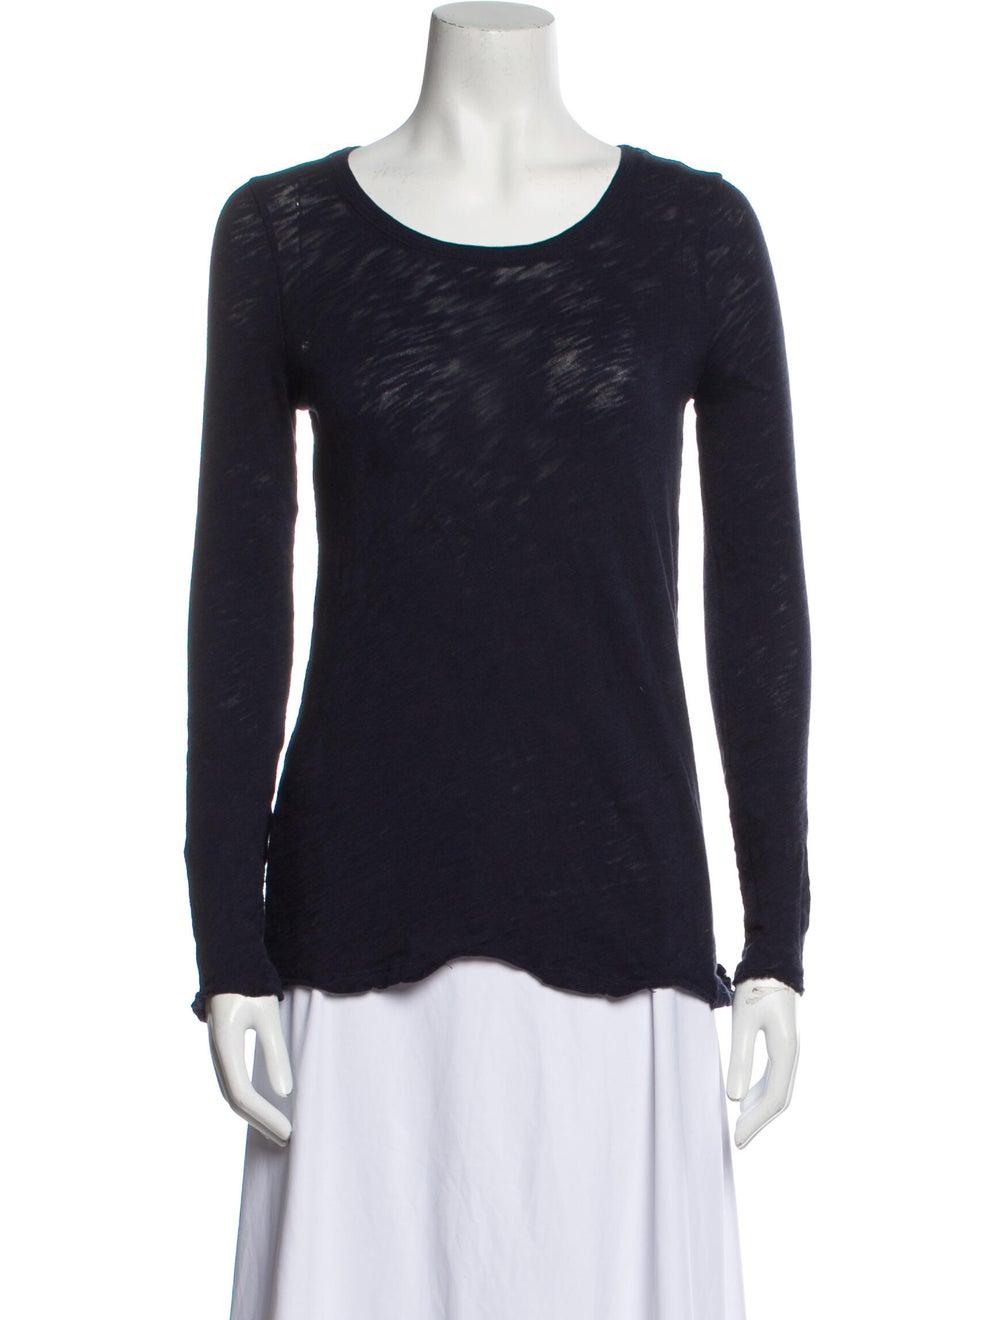 ATM Scoop Neck Long Sleeve T-Shirt Blue - image 1